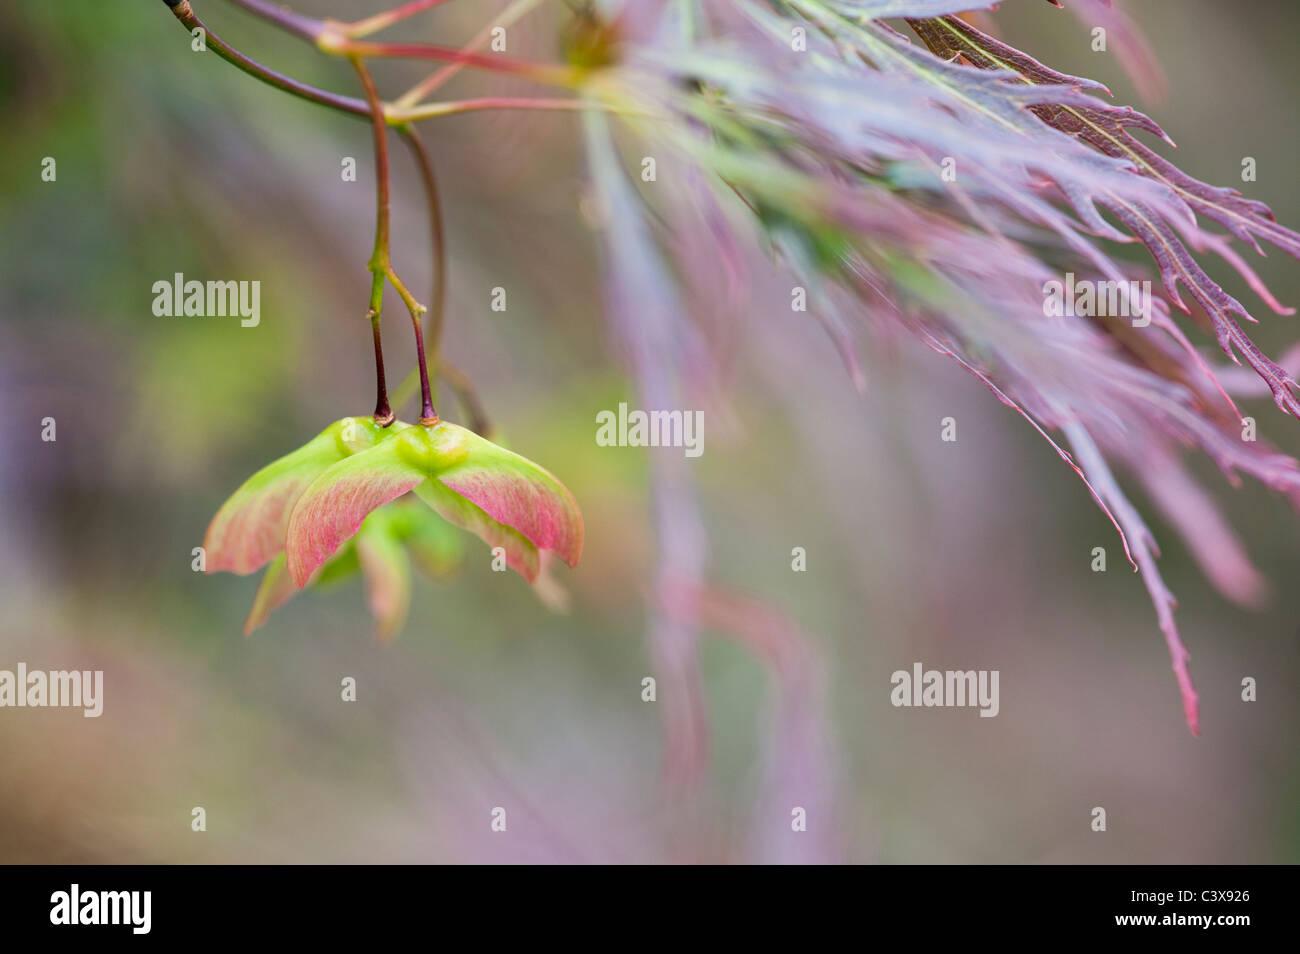 Acer palmatum var. Dissectum. Arce japonés suavizar las hojas y las vainas Imagen De Stock